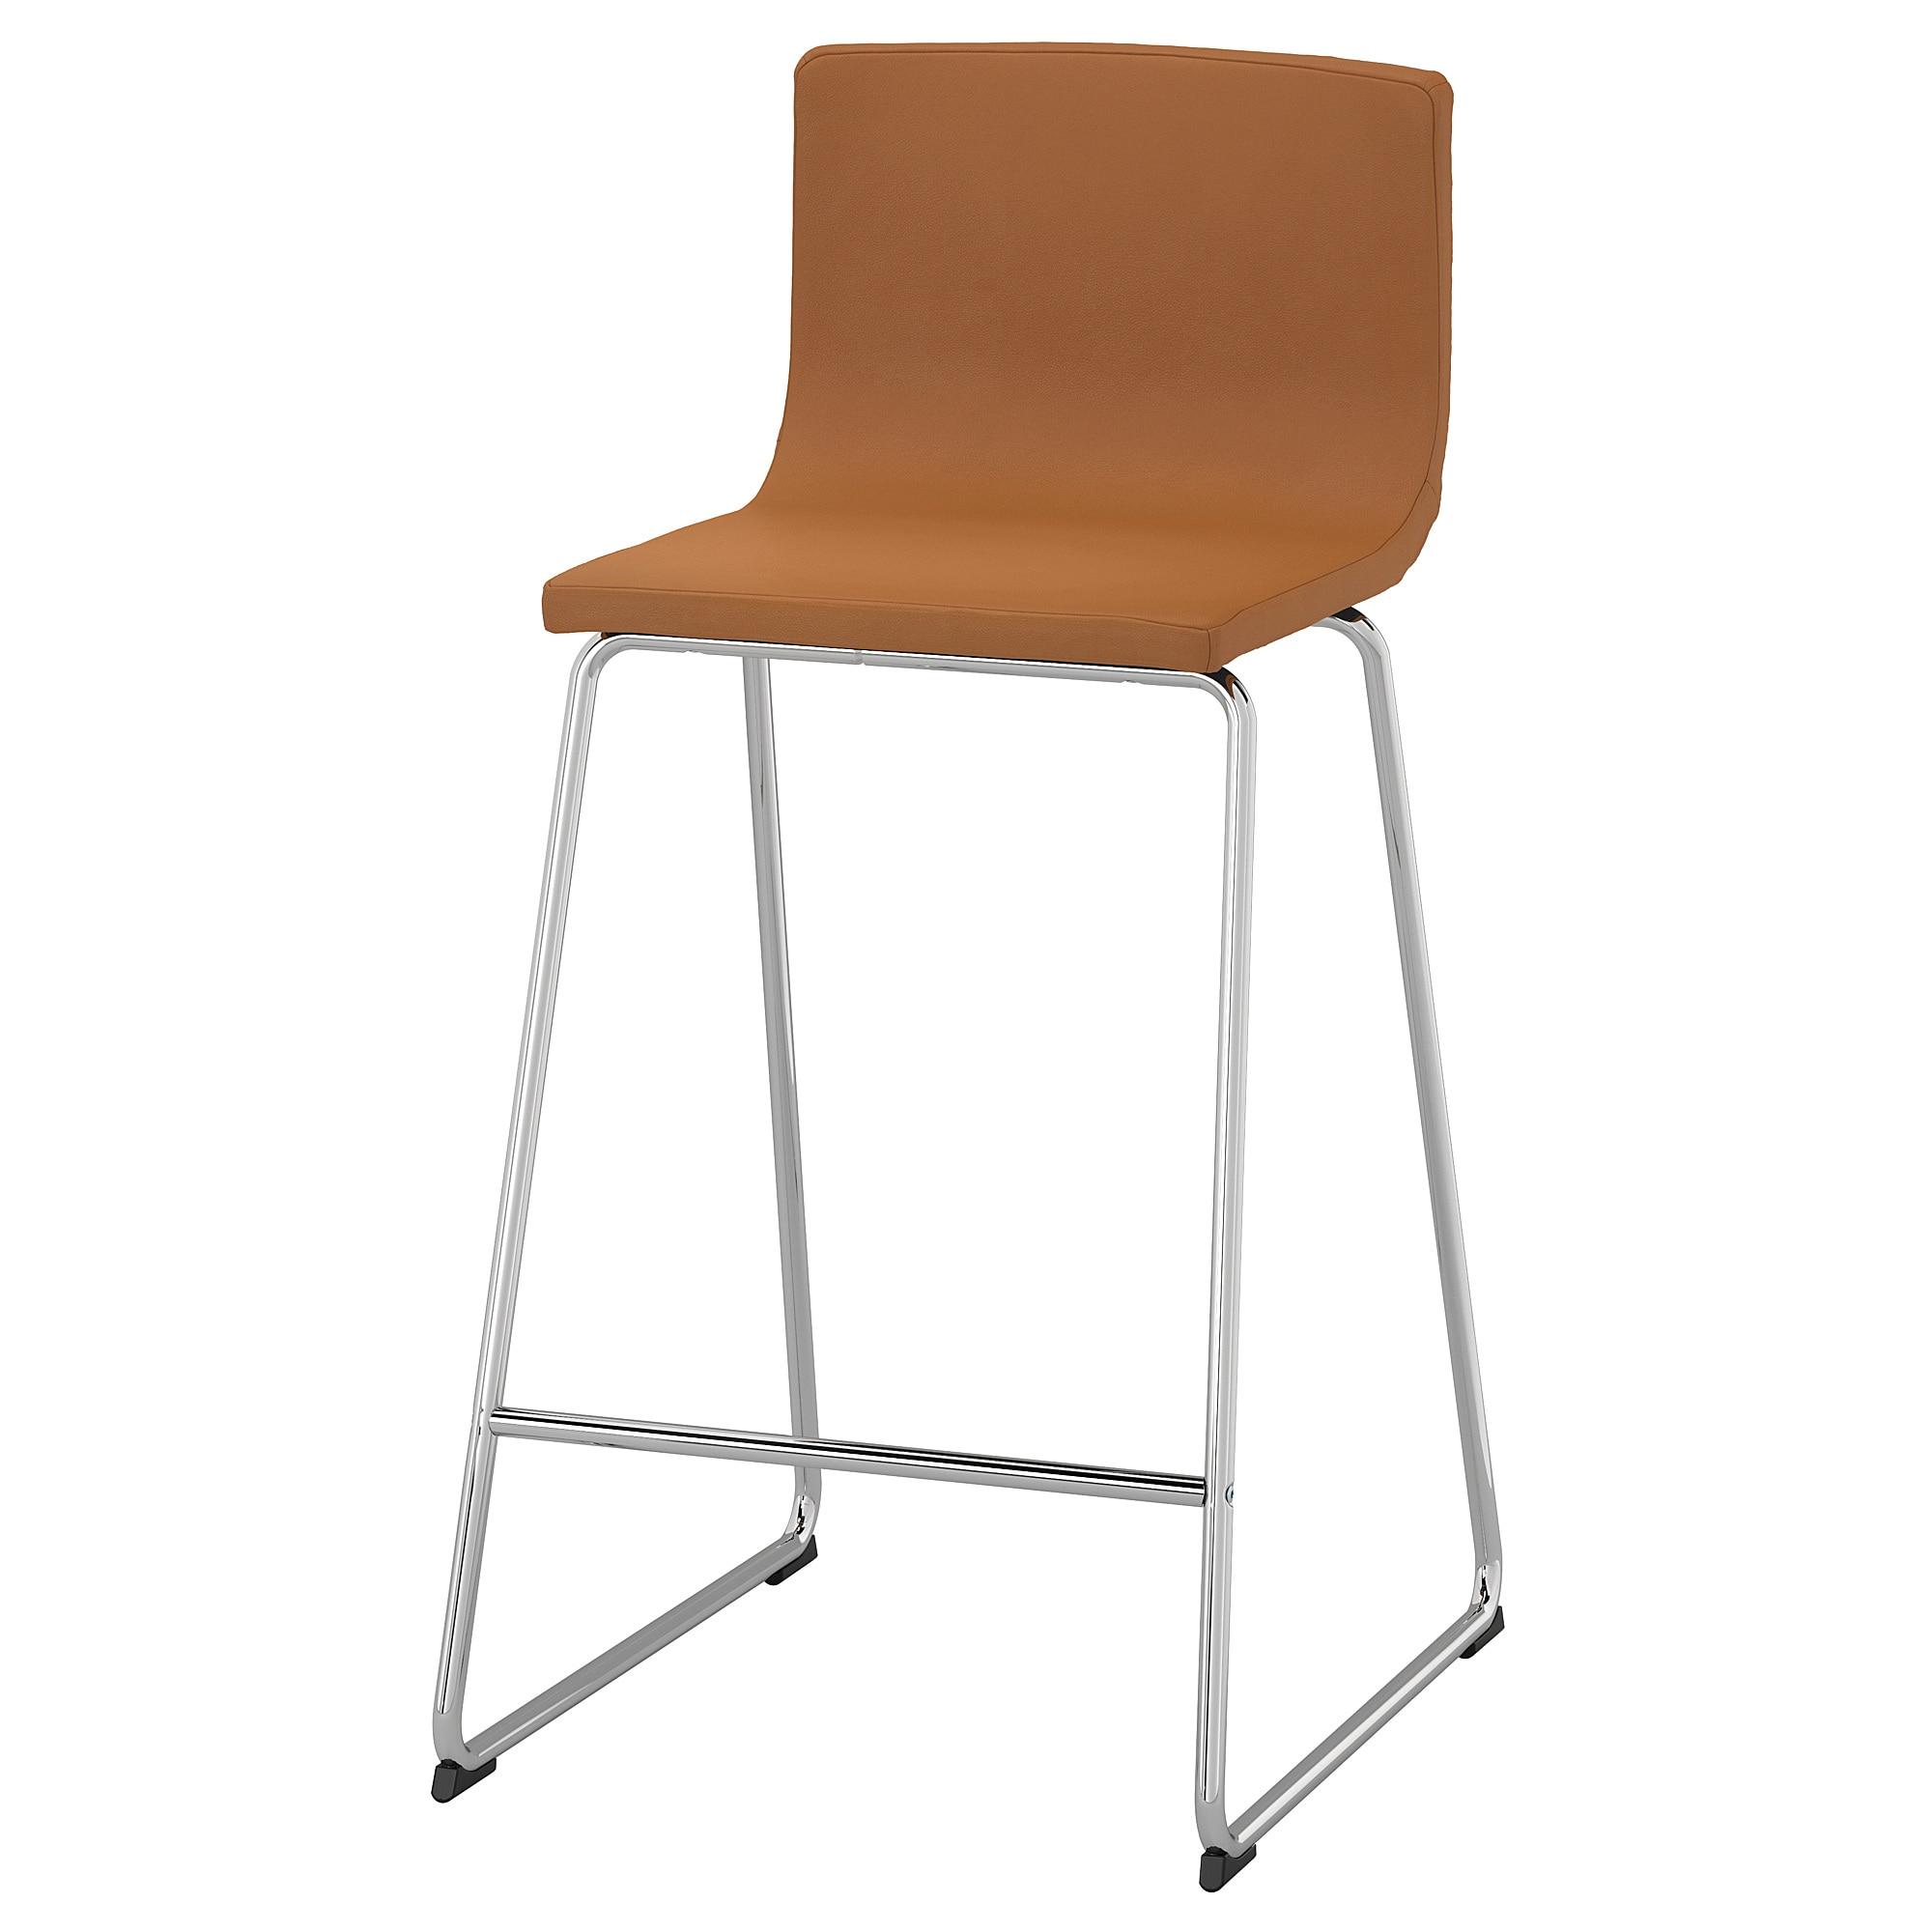 Ikea Us Furniture And Home Furnishings Bar Stools Stool Chrome Plating